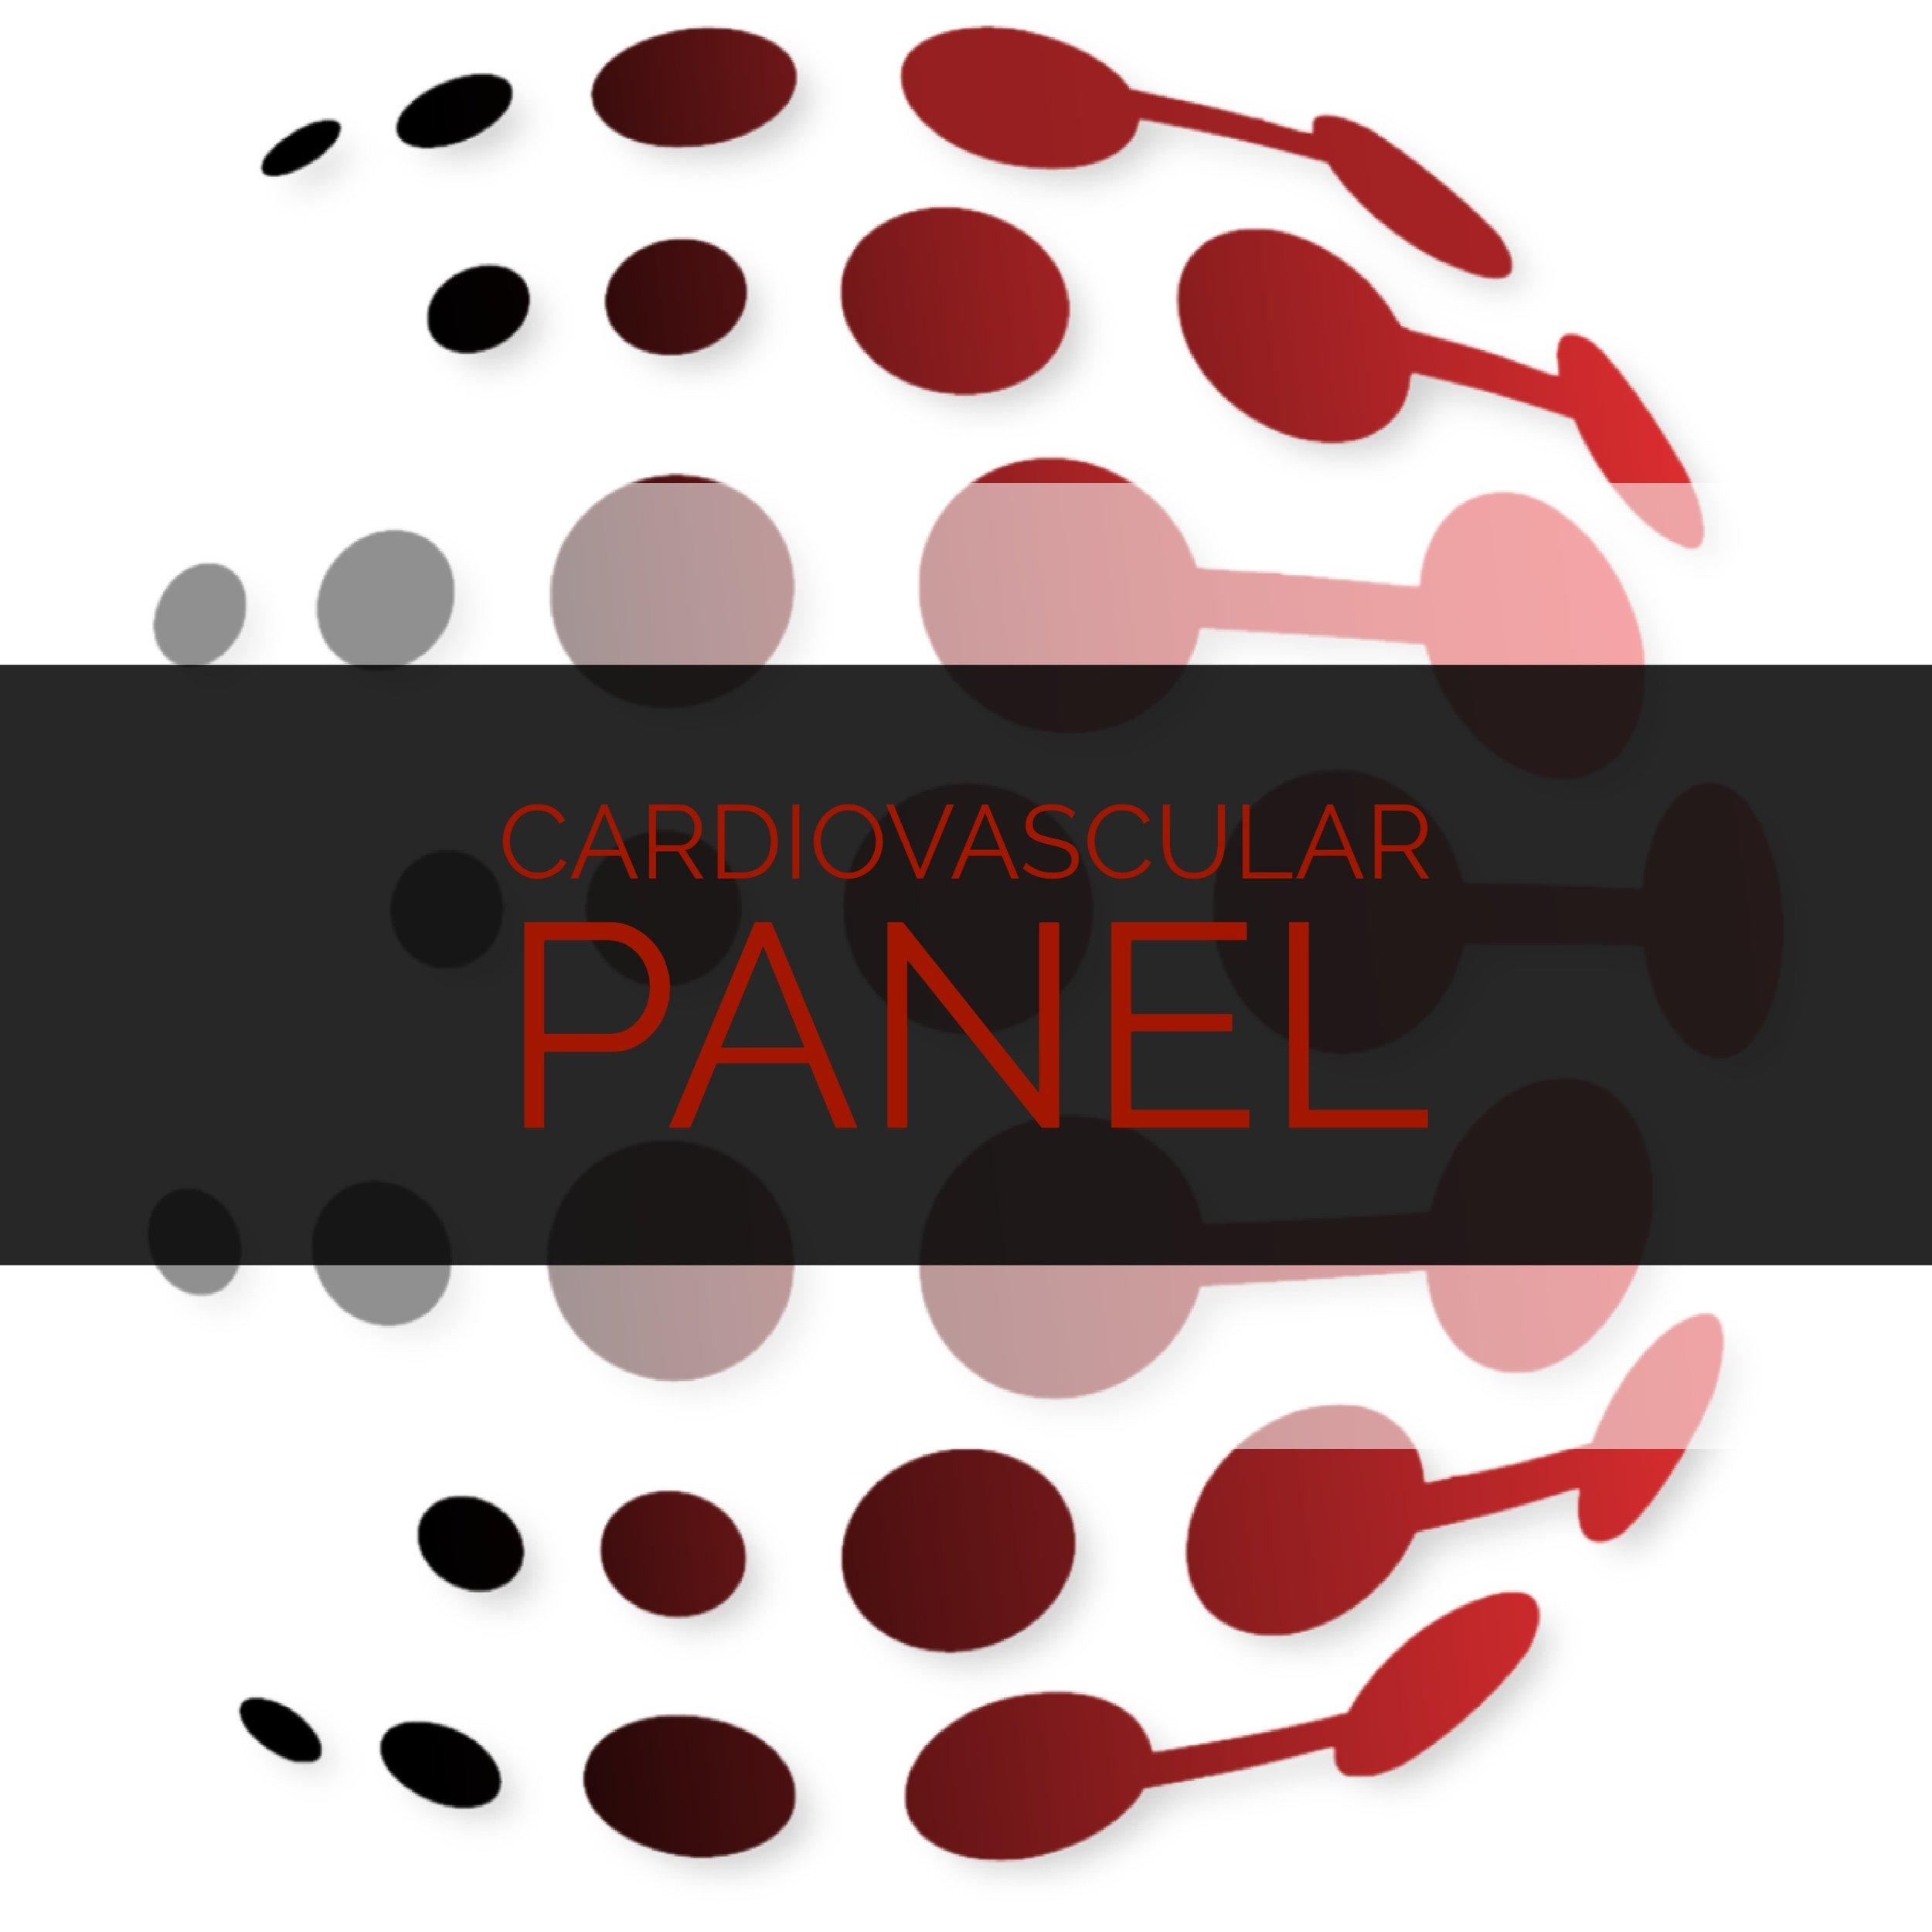 Cardiovascular Panel